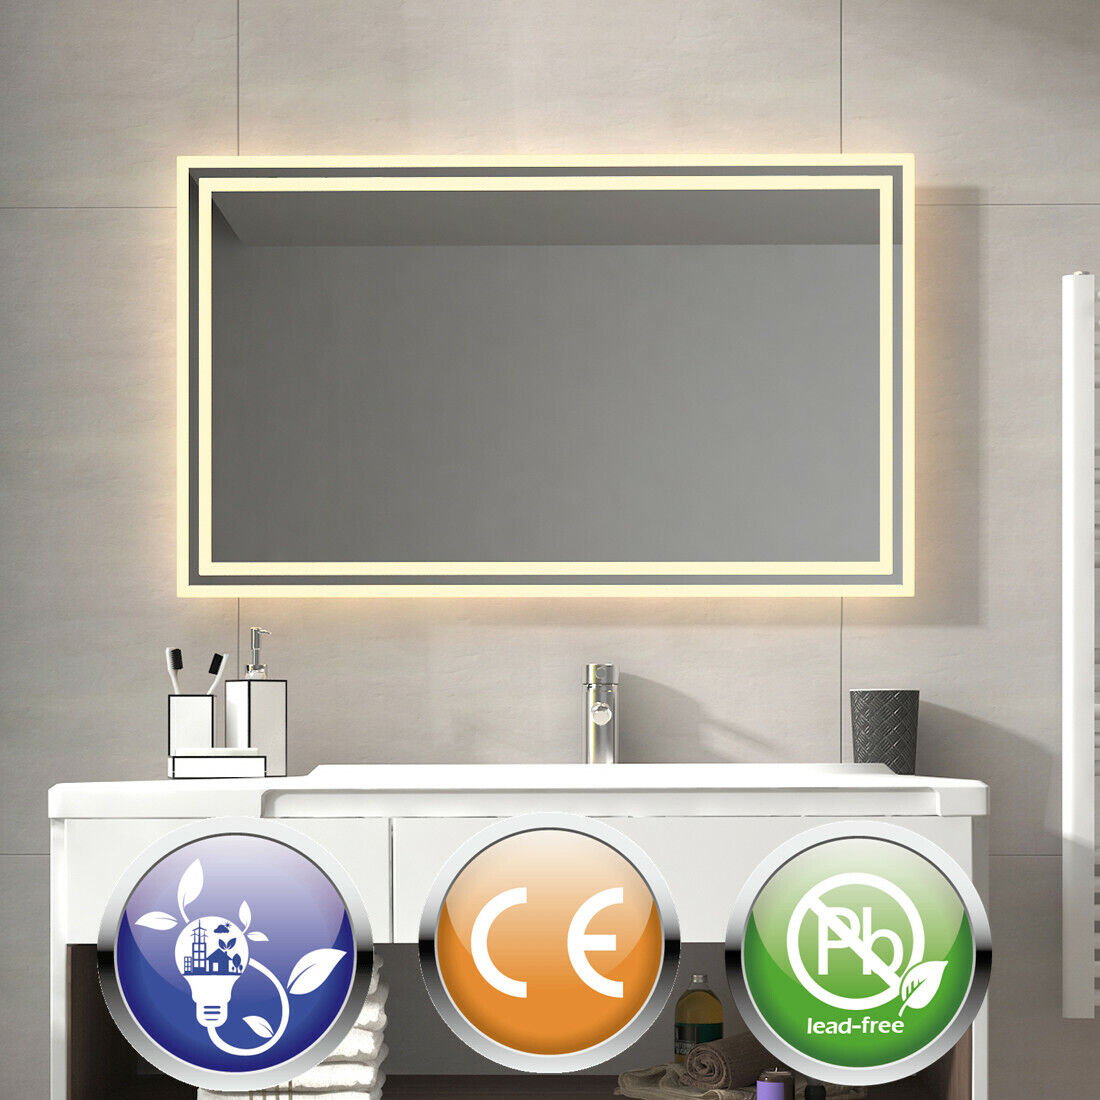 LED Badspiegel mit Beleuchtung Warmweiß Wandspiegel  60x80 80x60100x60 120x60cm